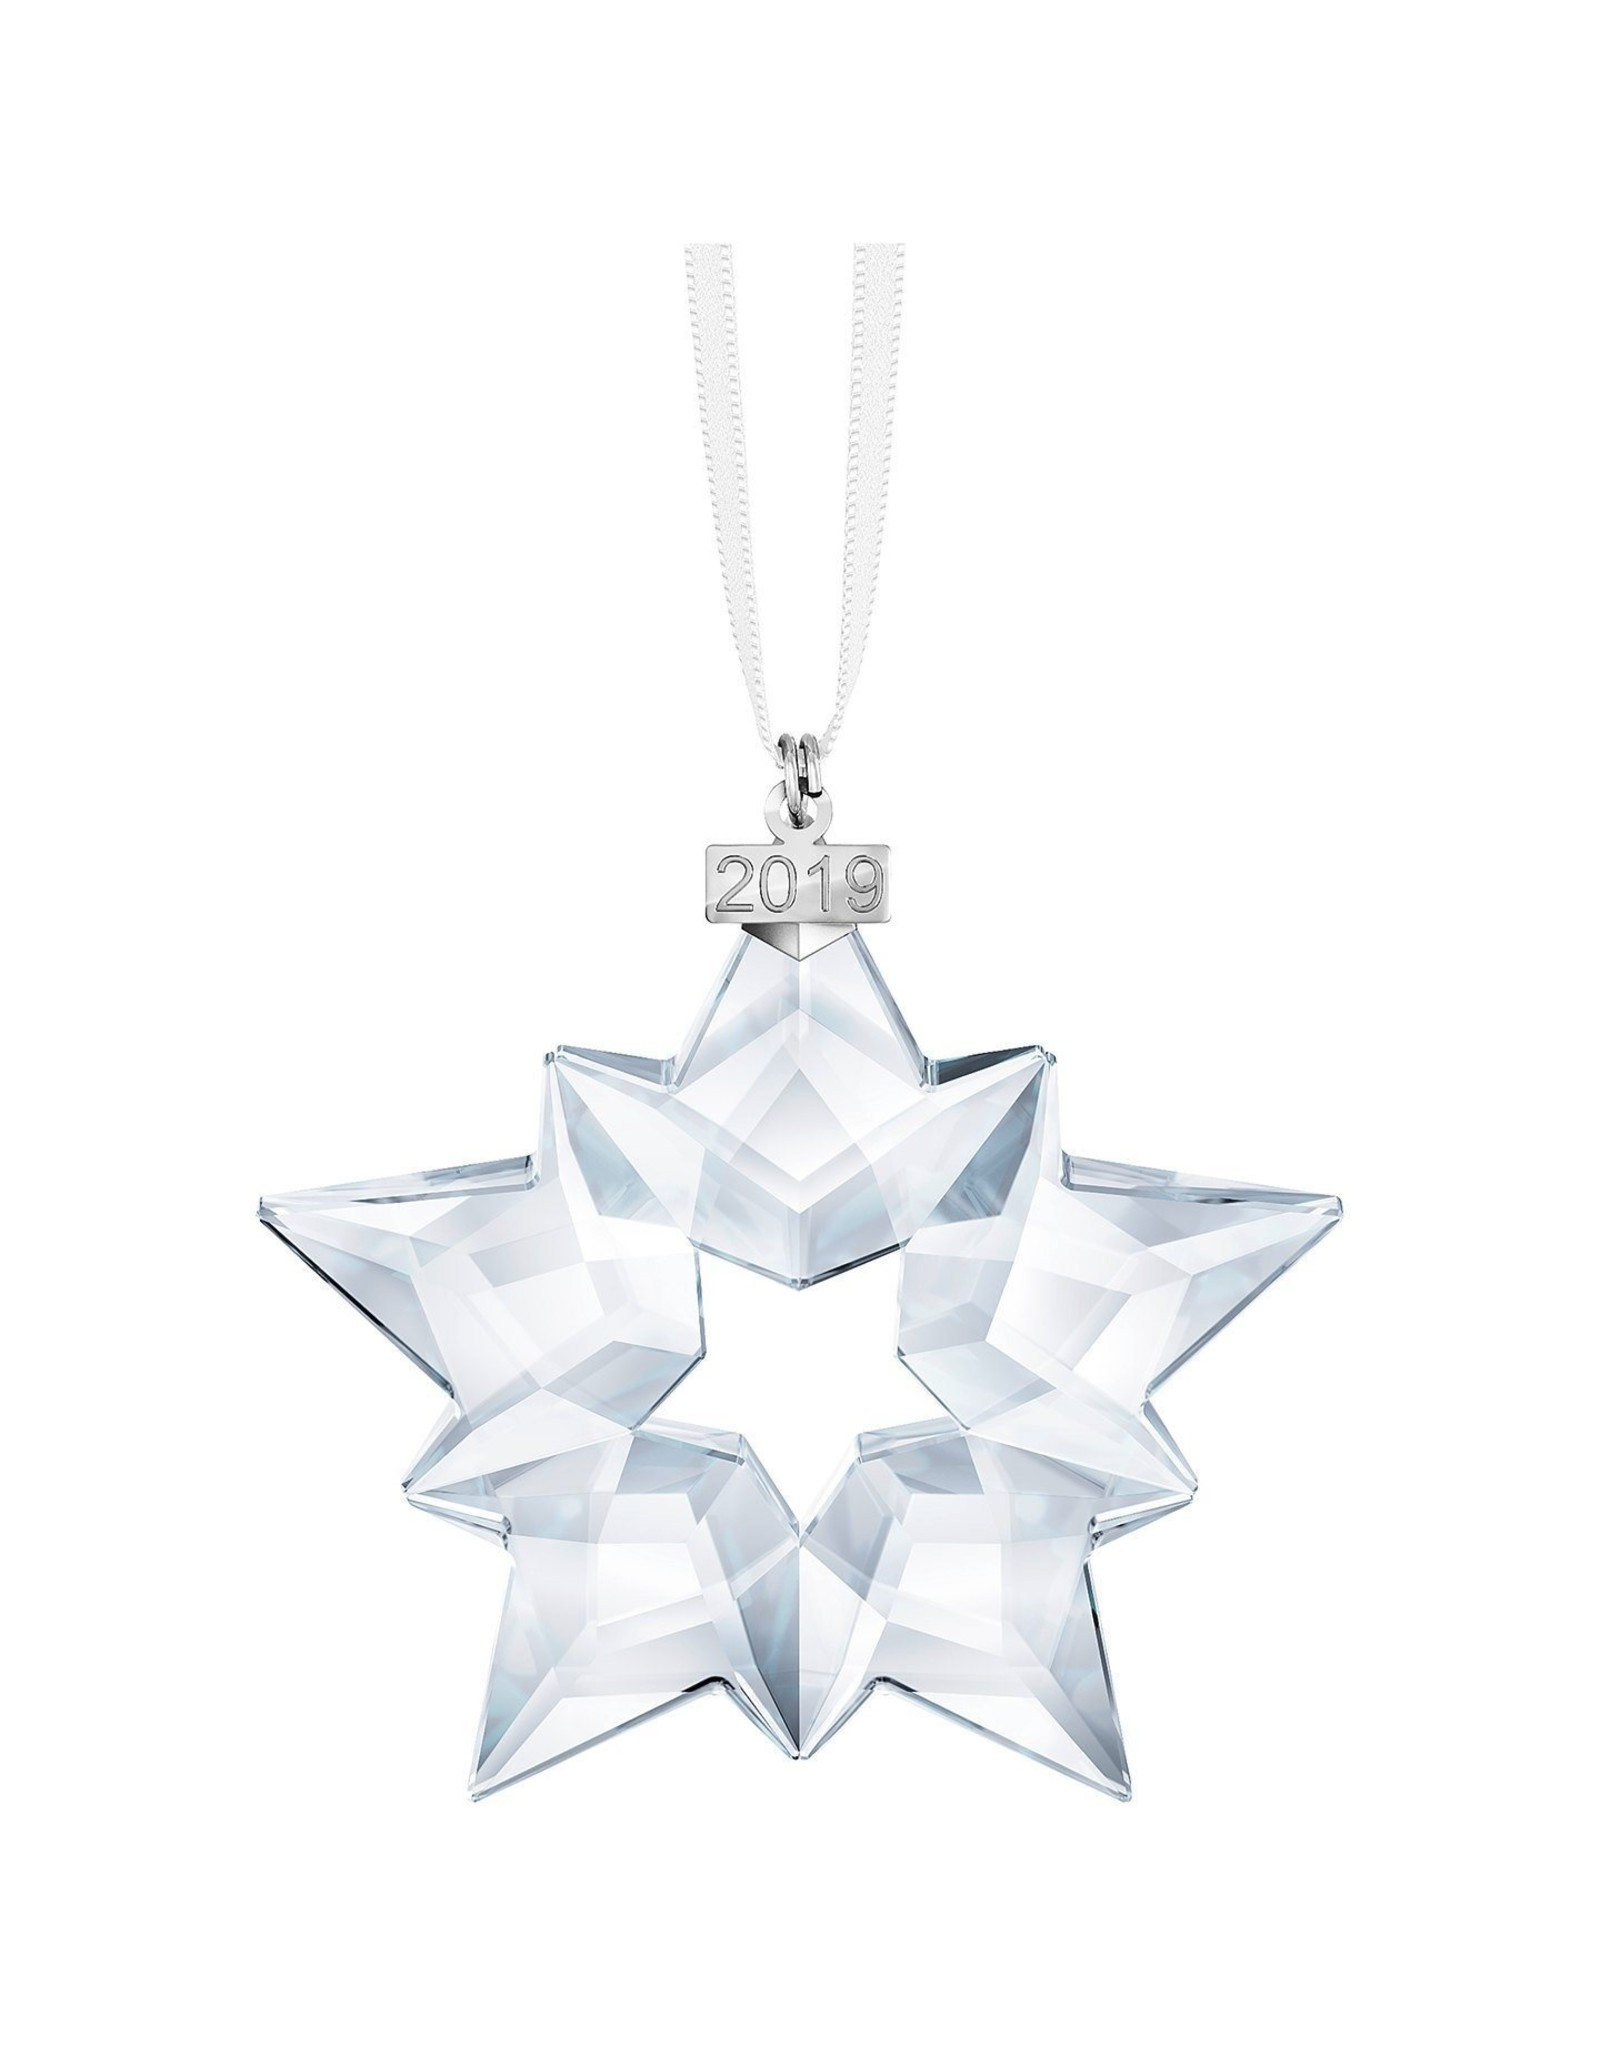 Swarovski Swarovski Christmas Ornament 2019